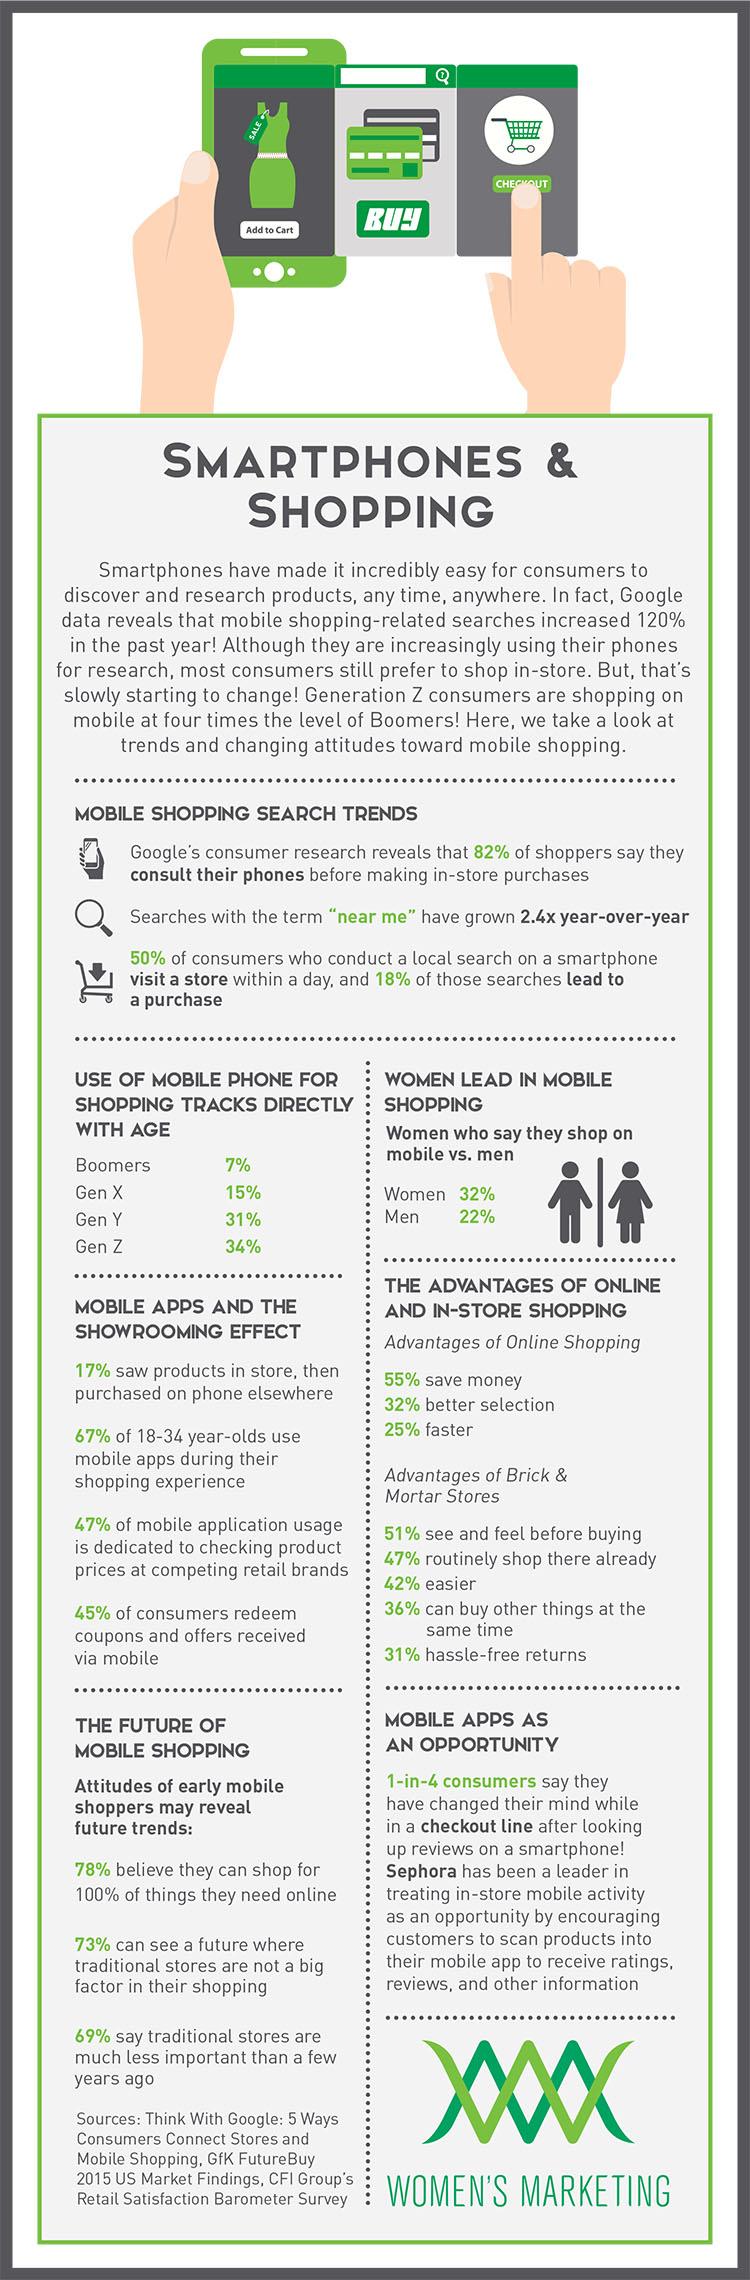 SmartphonesShopping_Infographic.jpg